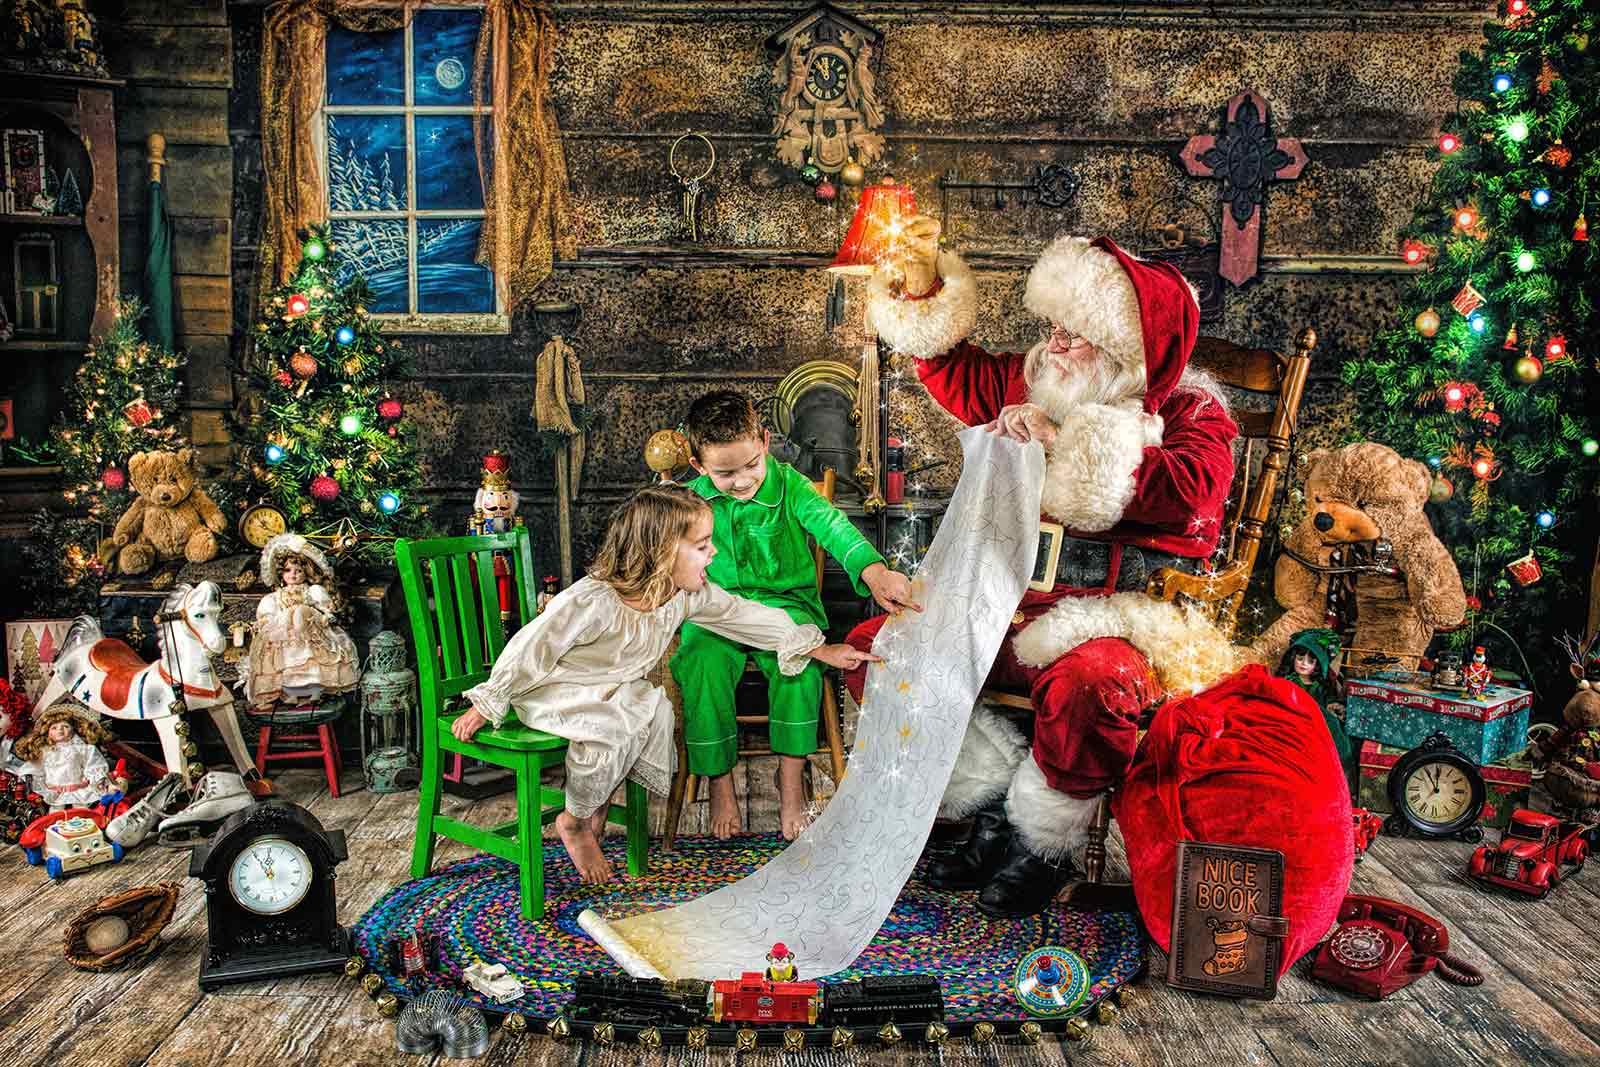 005_Magic-of-Santa-Anna-Thielen-Photography